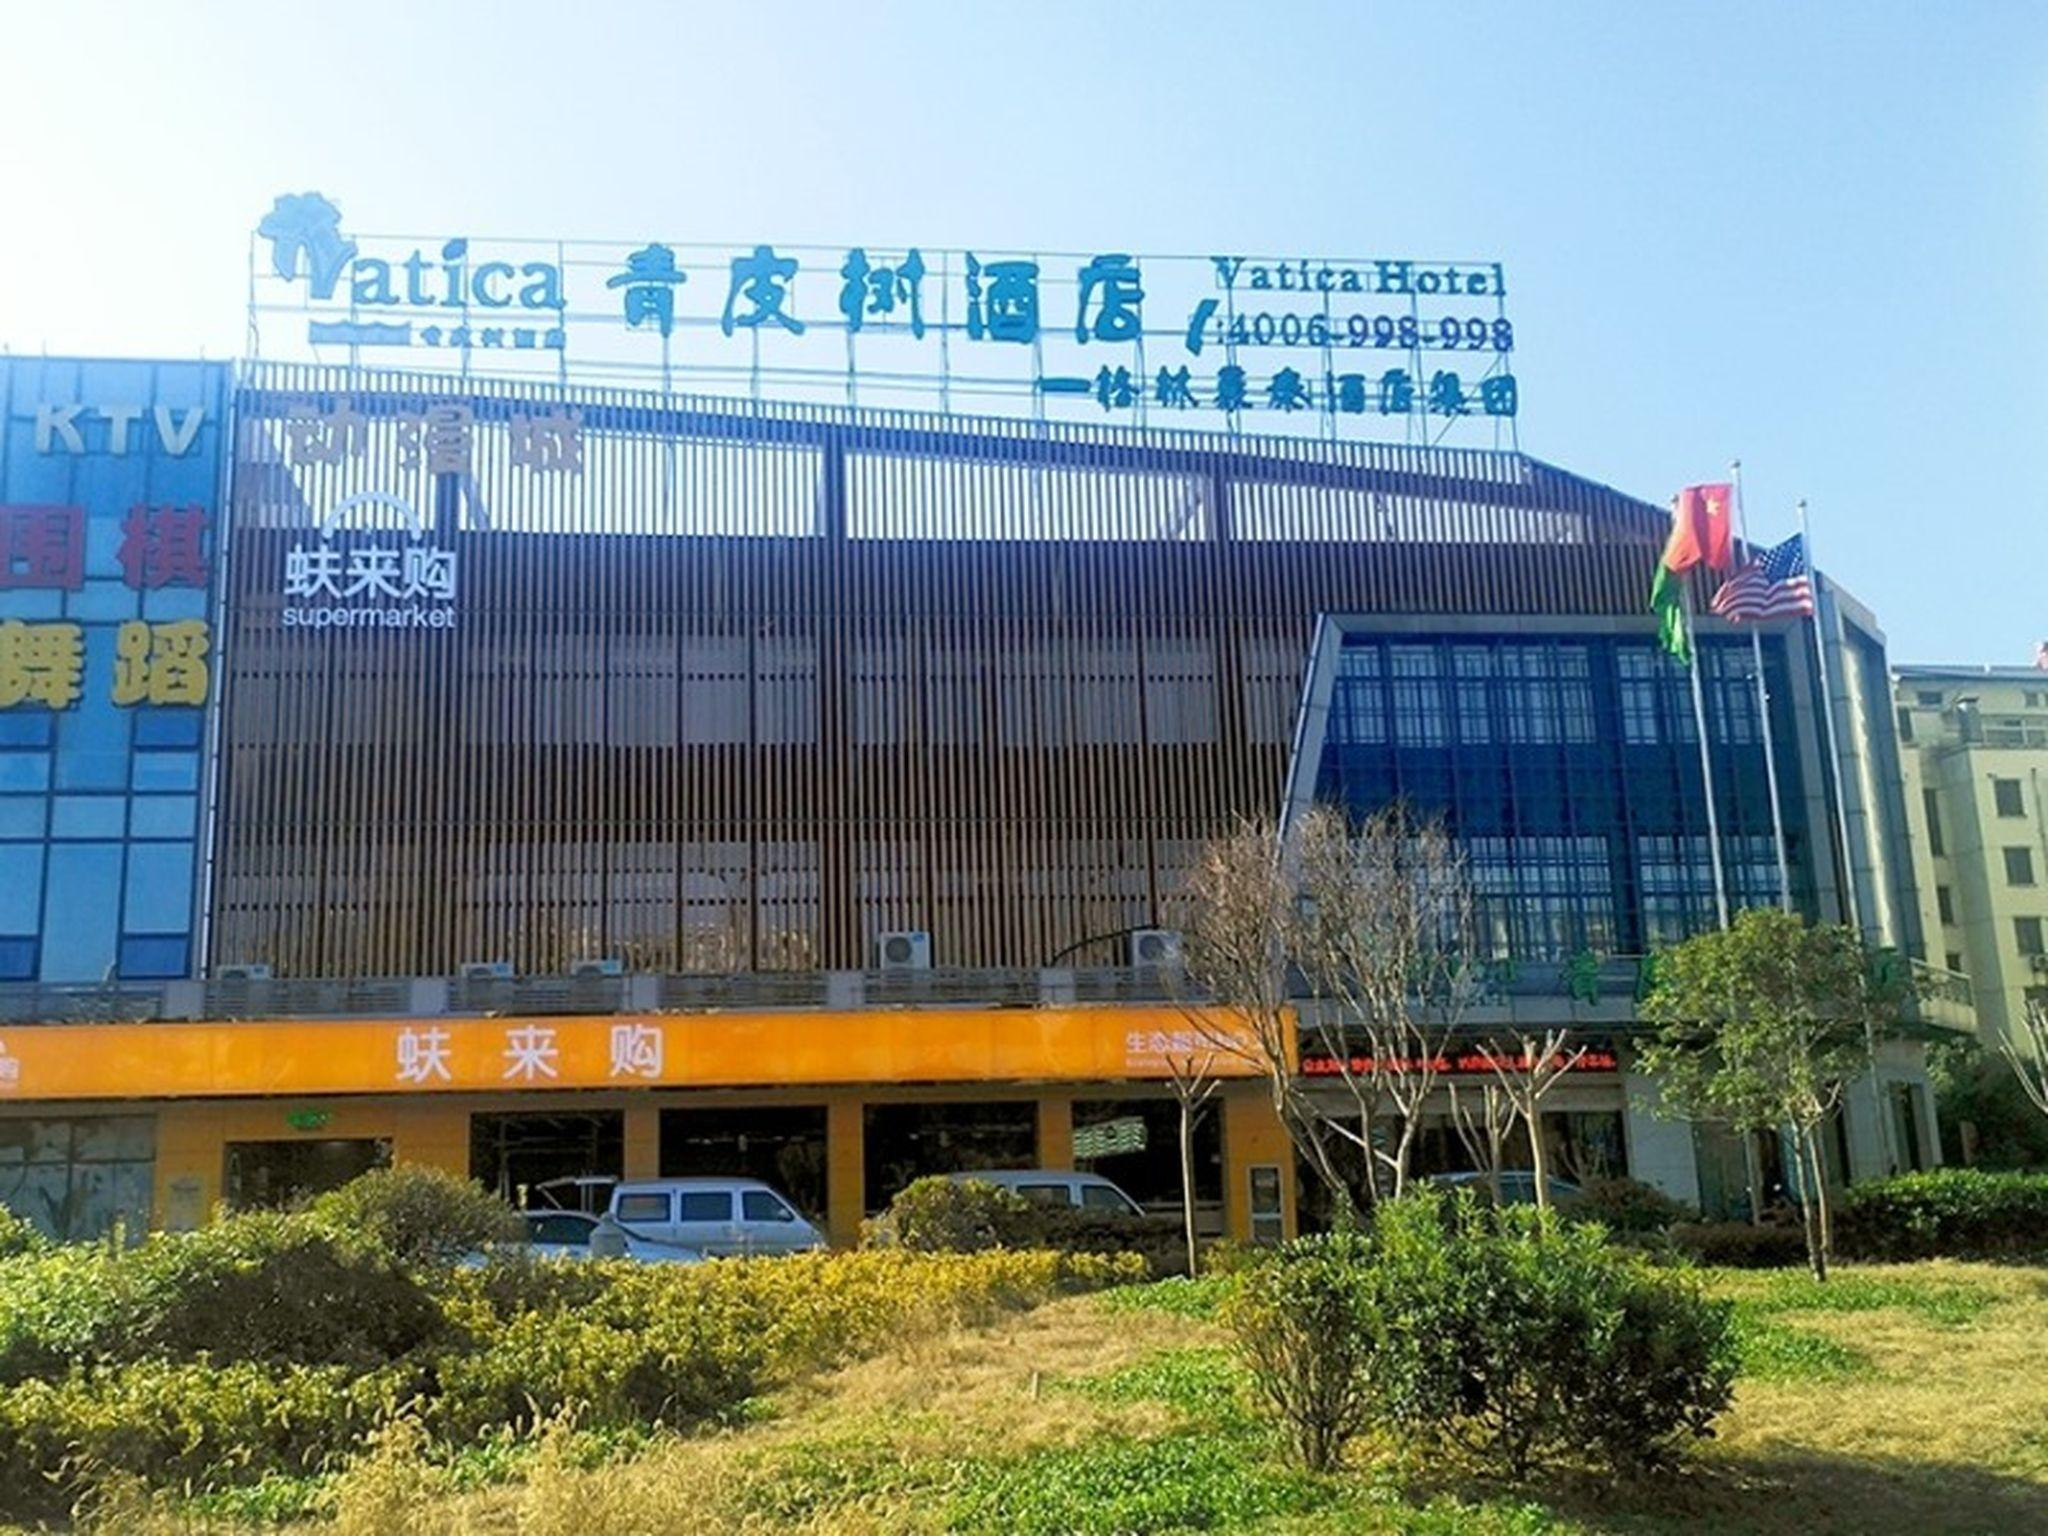 Vatica Wuxi Huishan District Western Shengan Road Baile Square Hotel